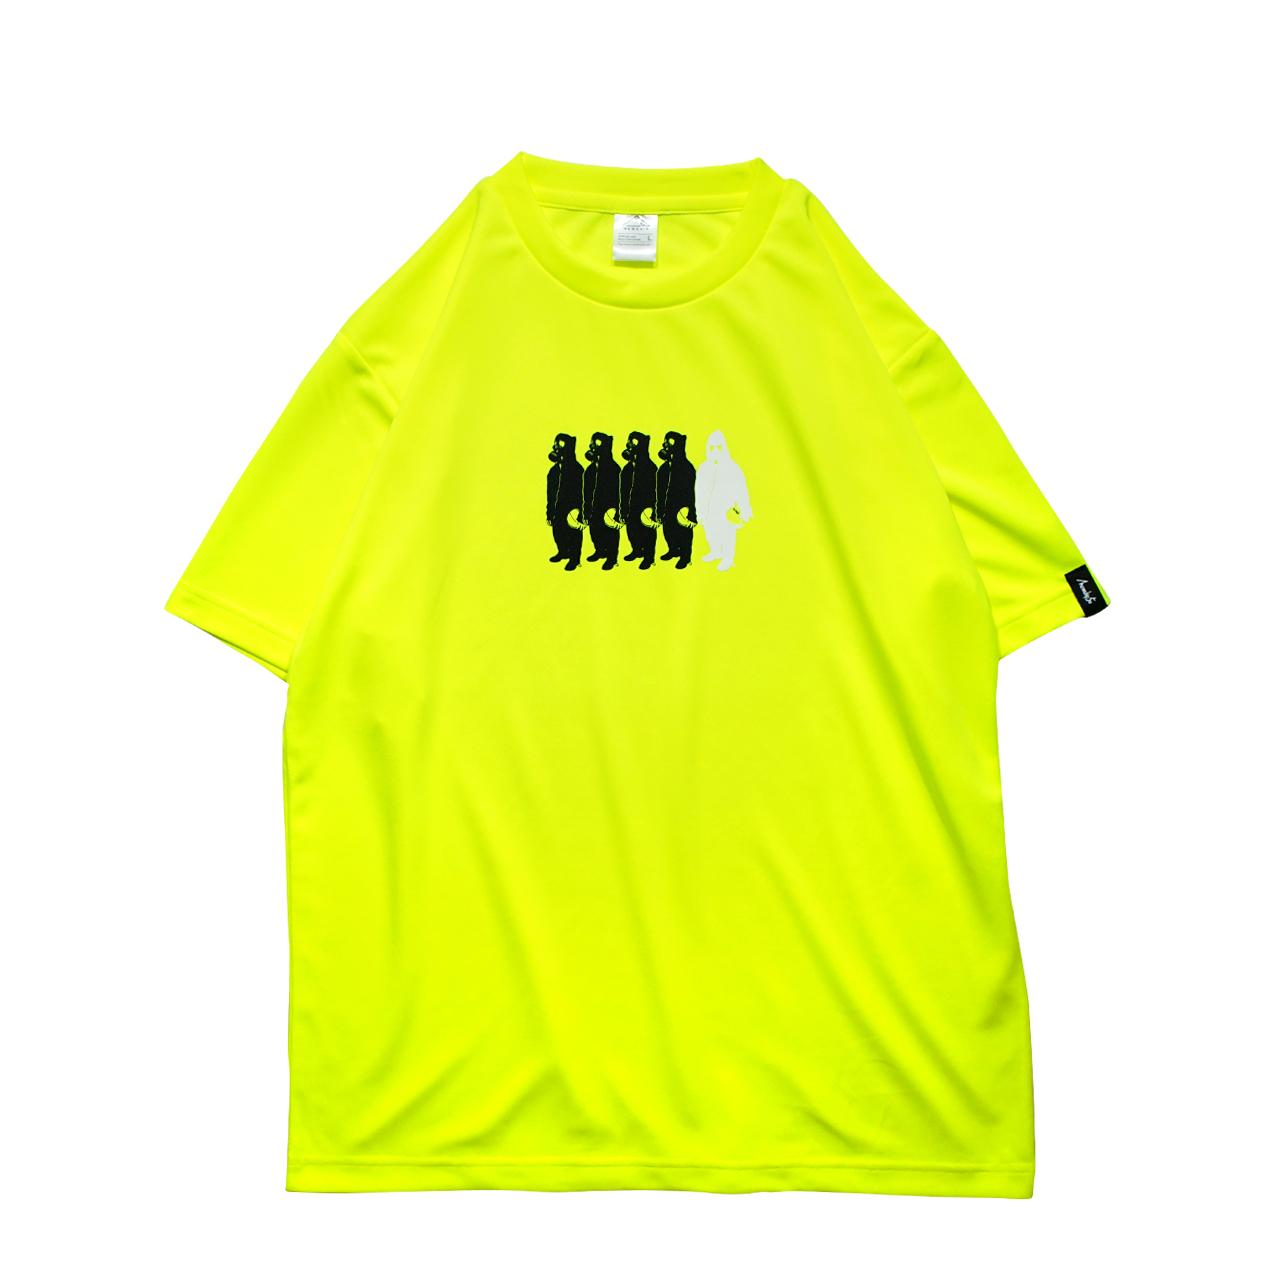 Little MICKYS 019 S/S PL <F.Yellow×Black×White > - 画像1